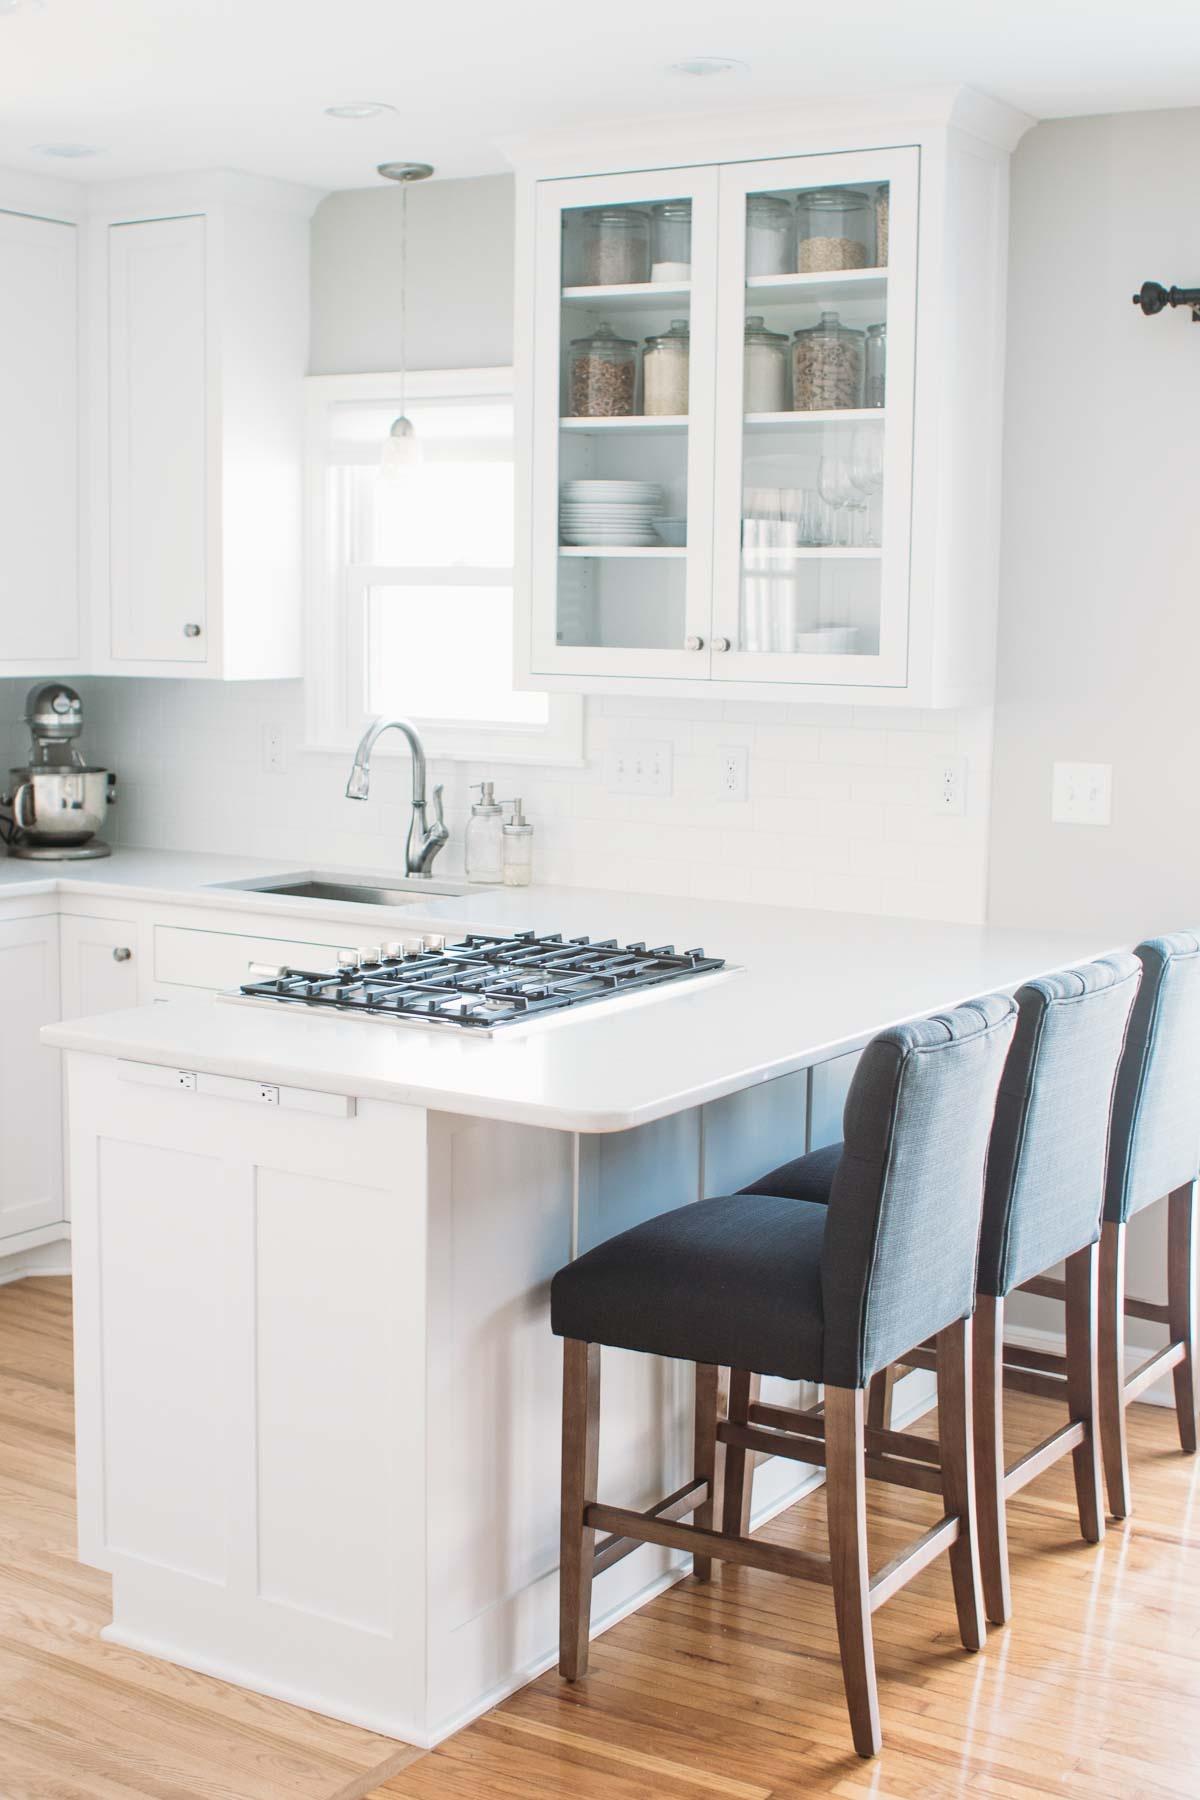 Most Efficient Design For A Kitchen